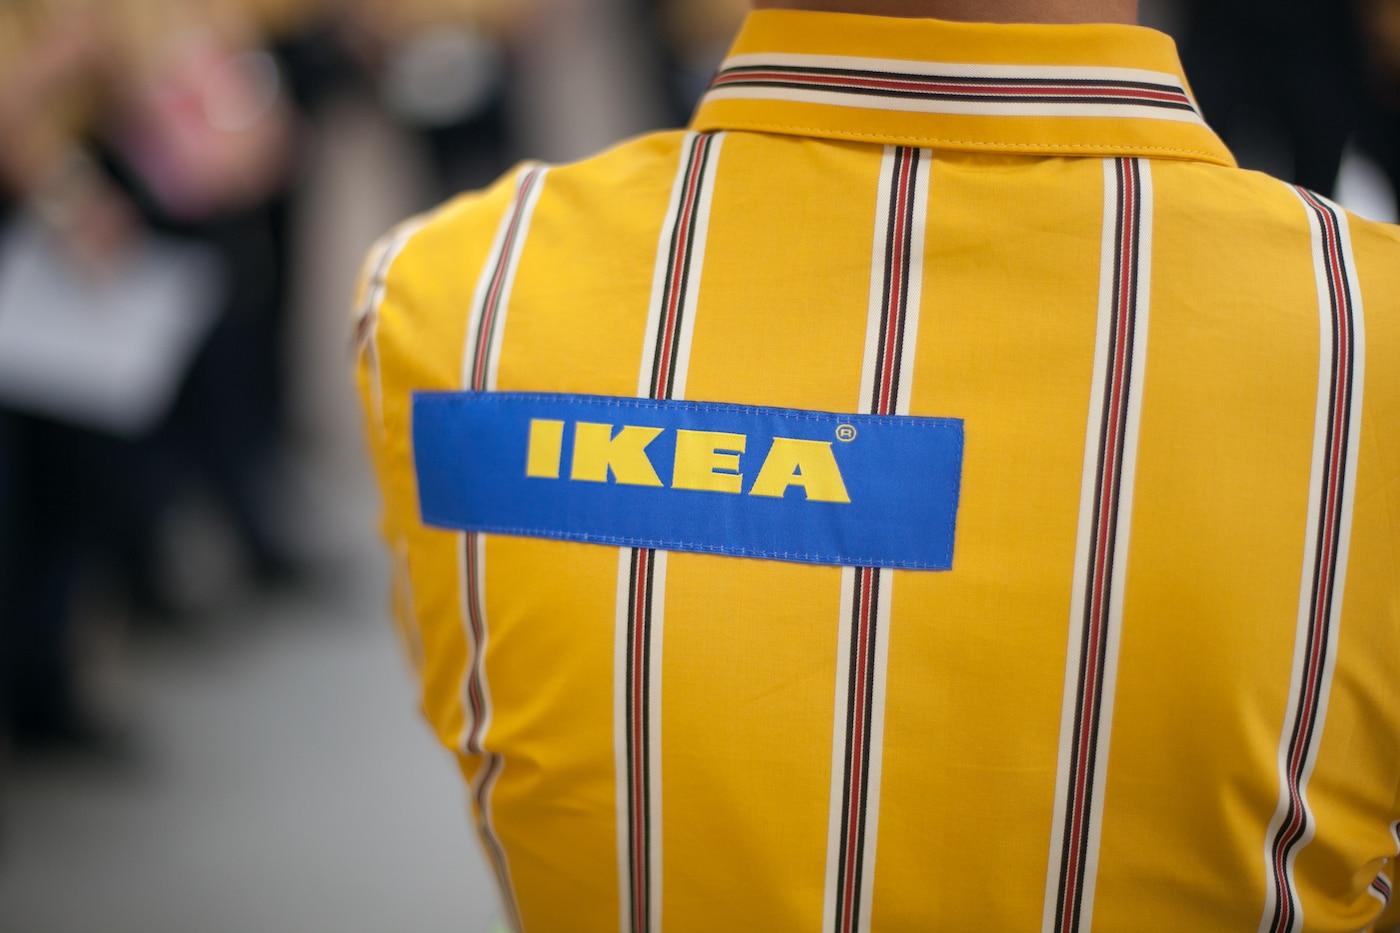 Siluettes of IKEA products